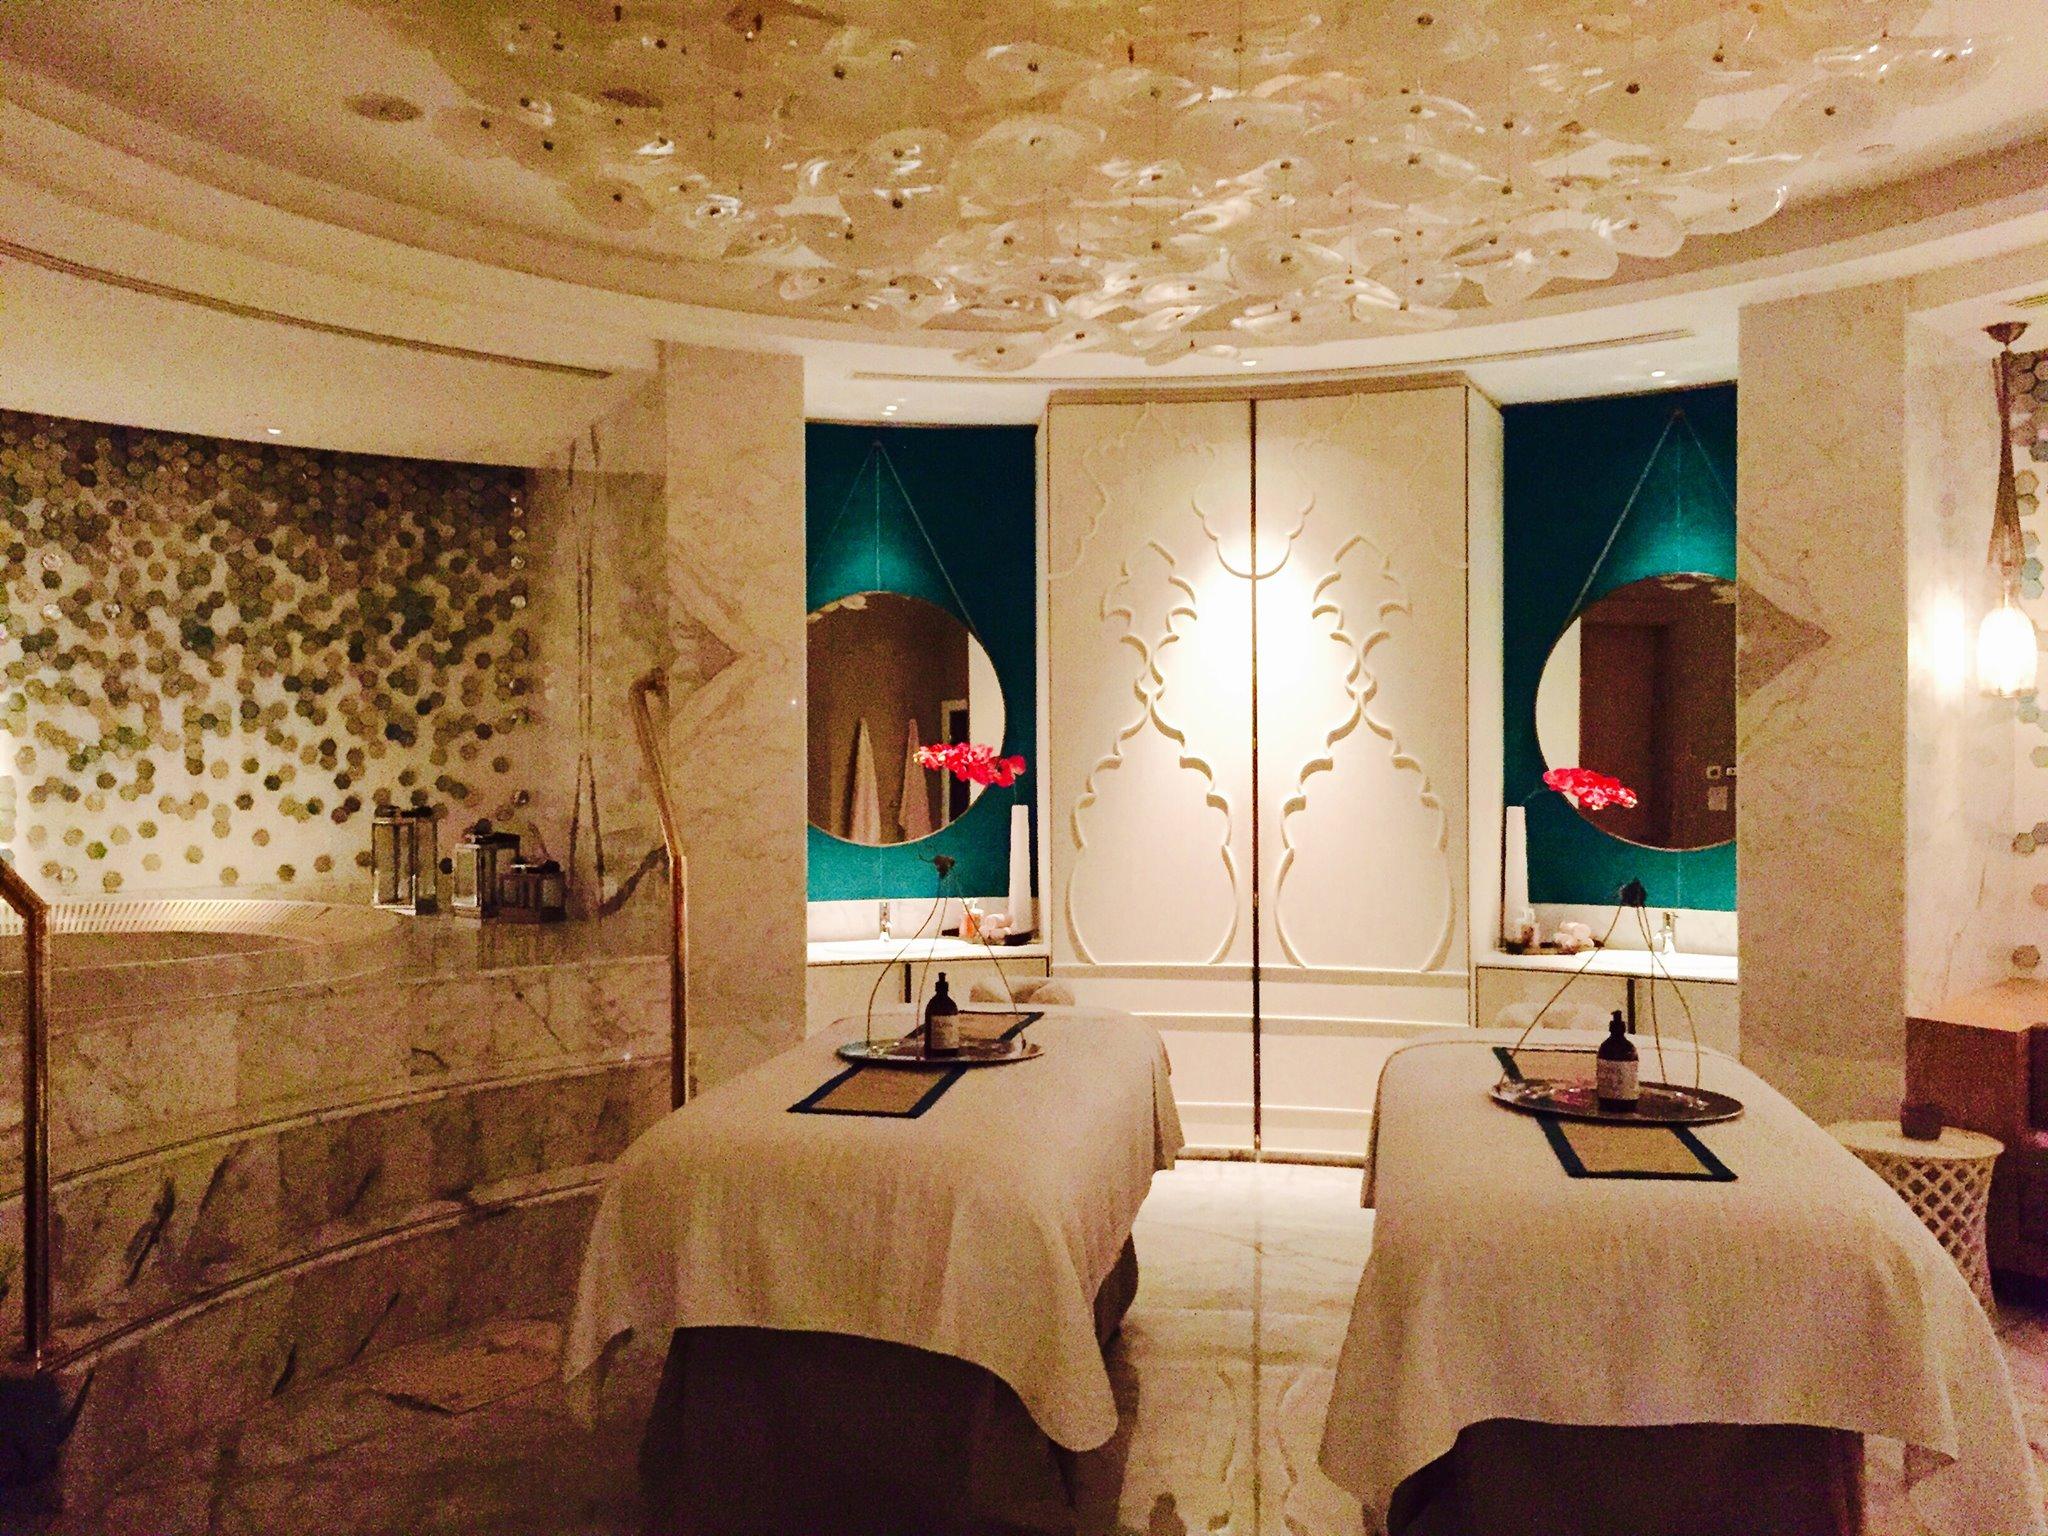 The sublime Spa at the Waldorf Astoria RAK